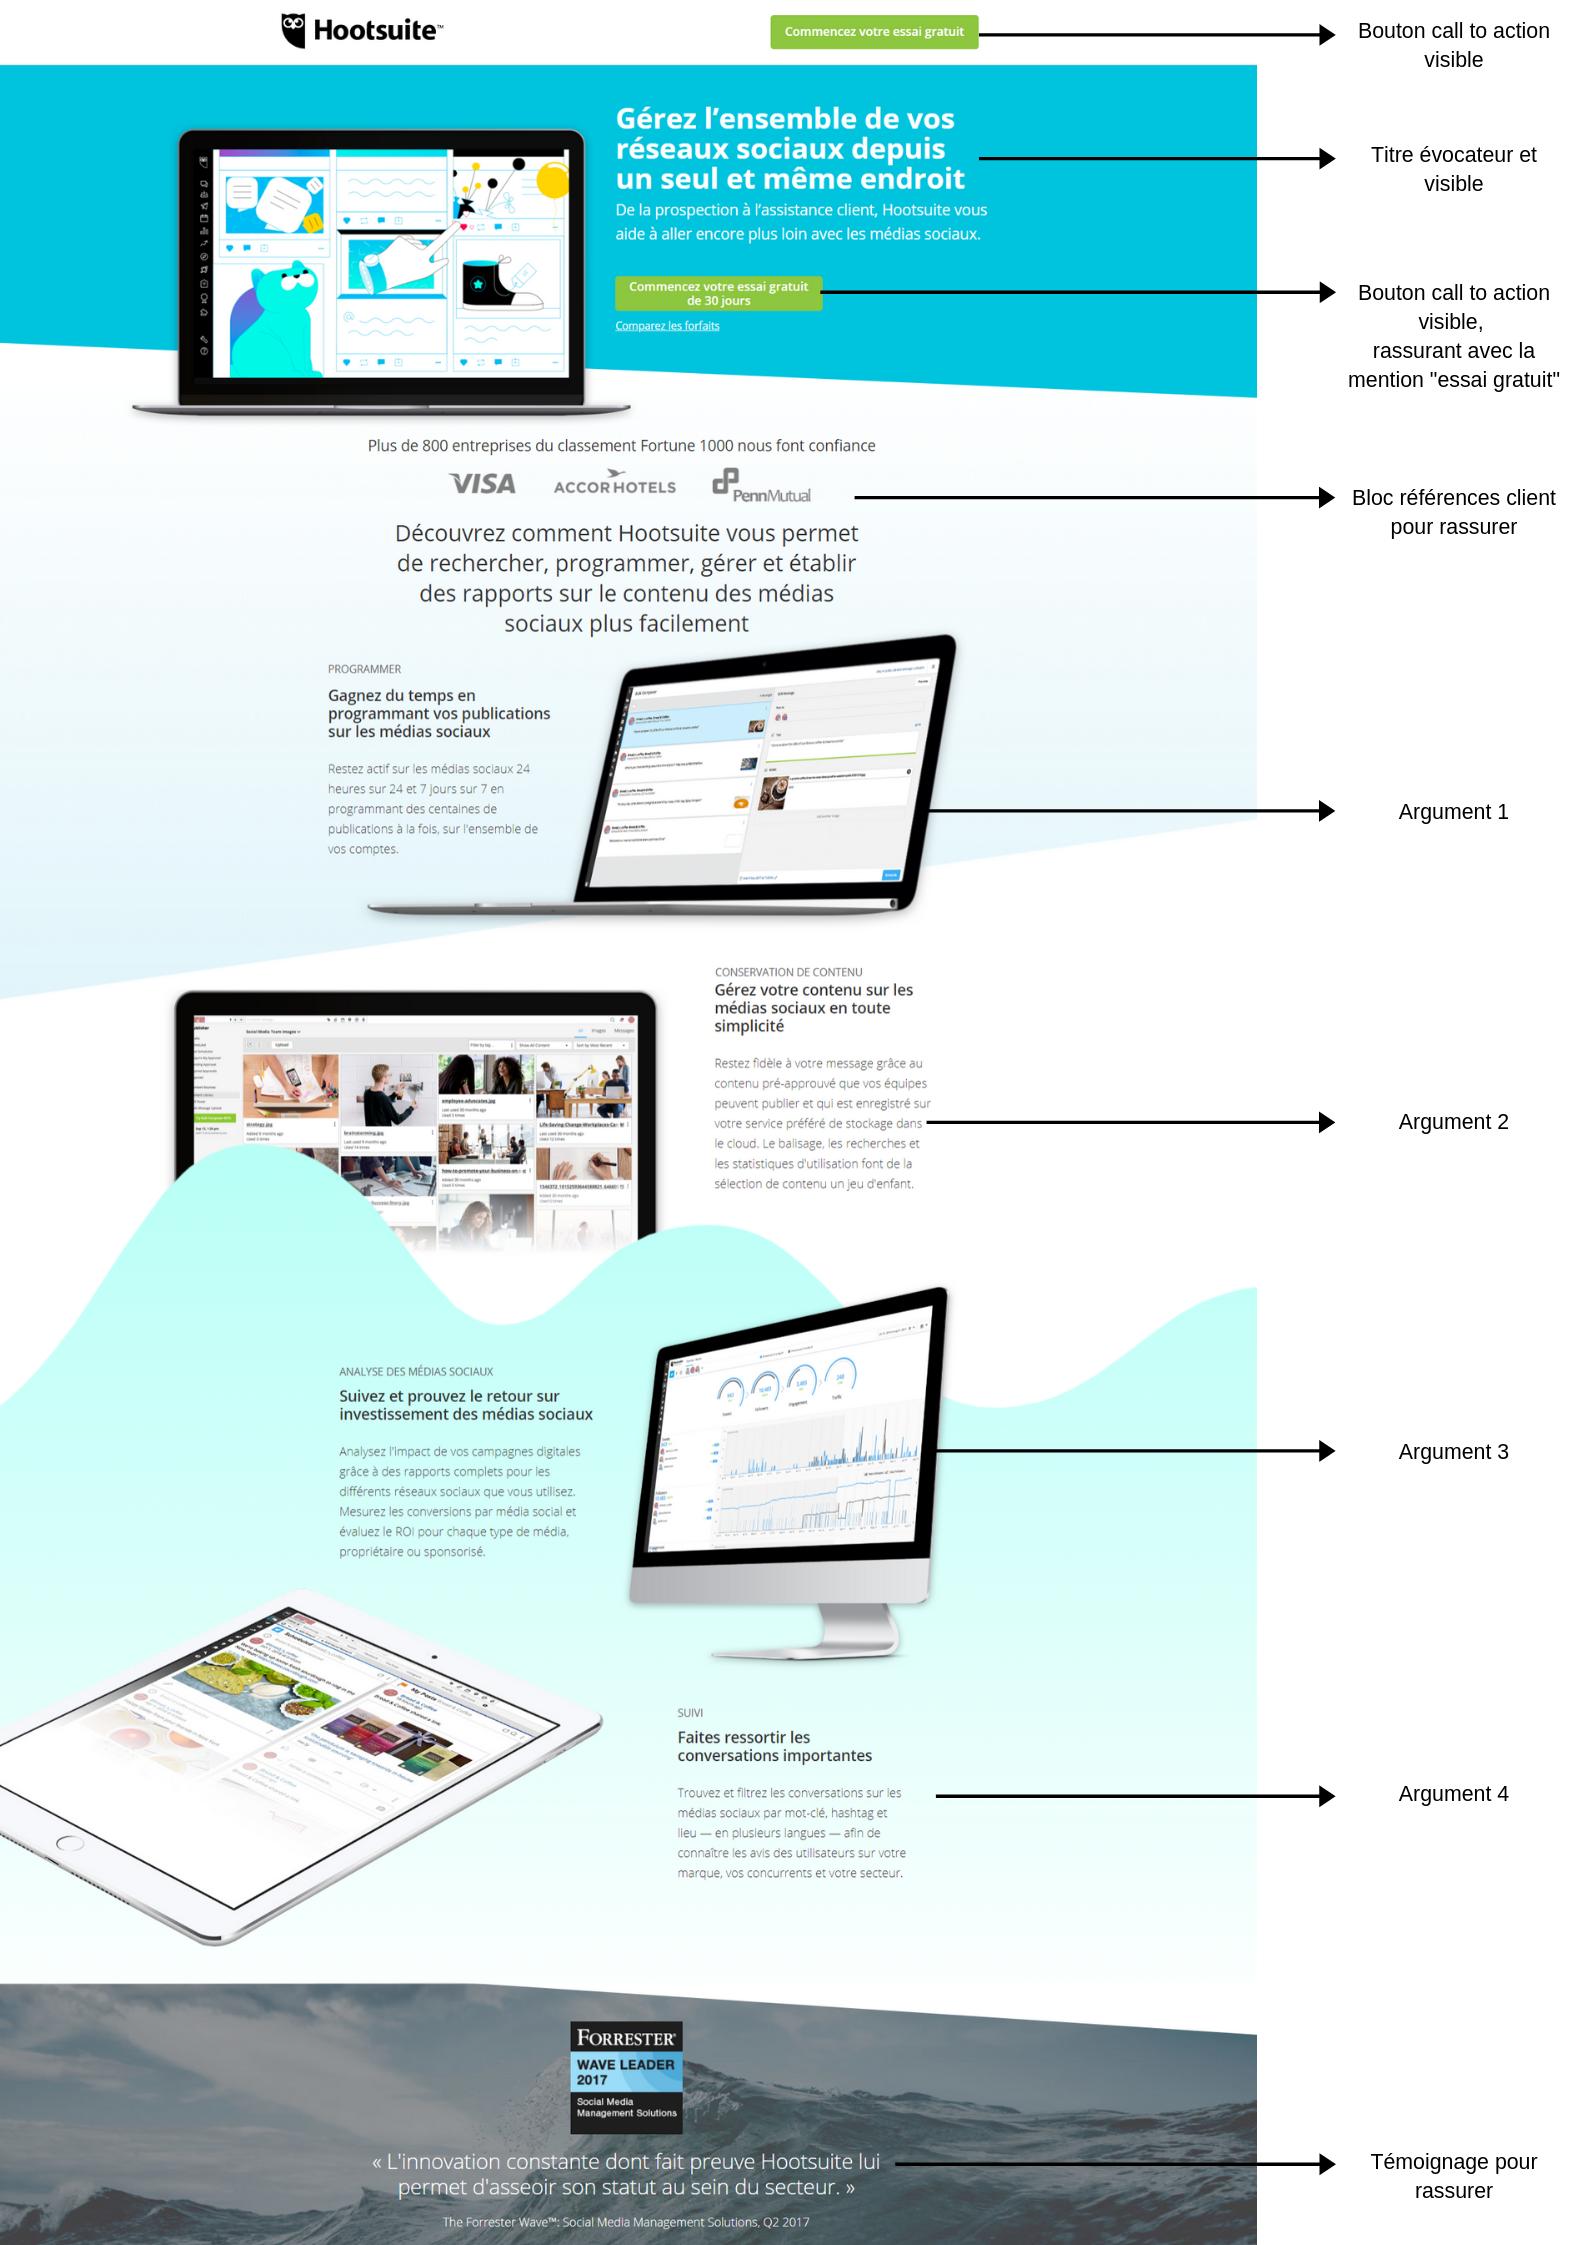 Landing page Hootsuite